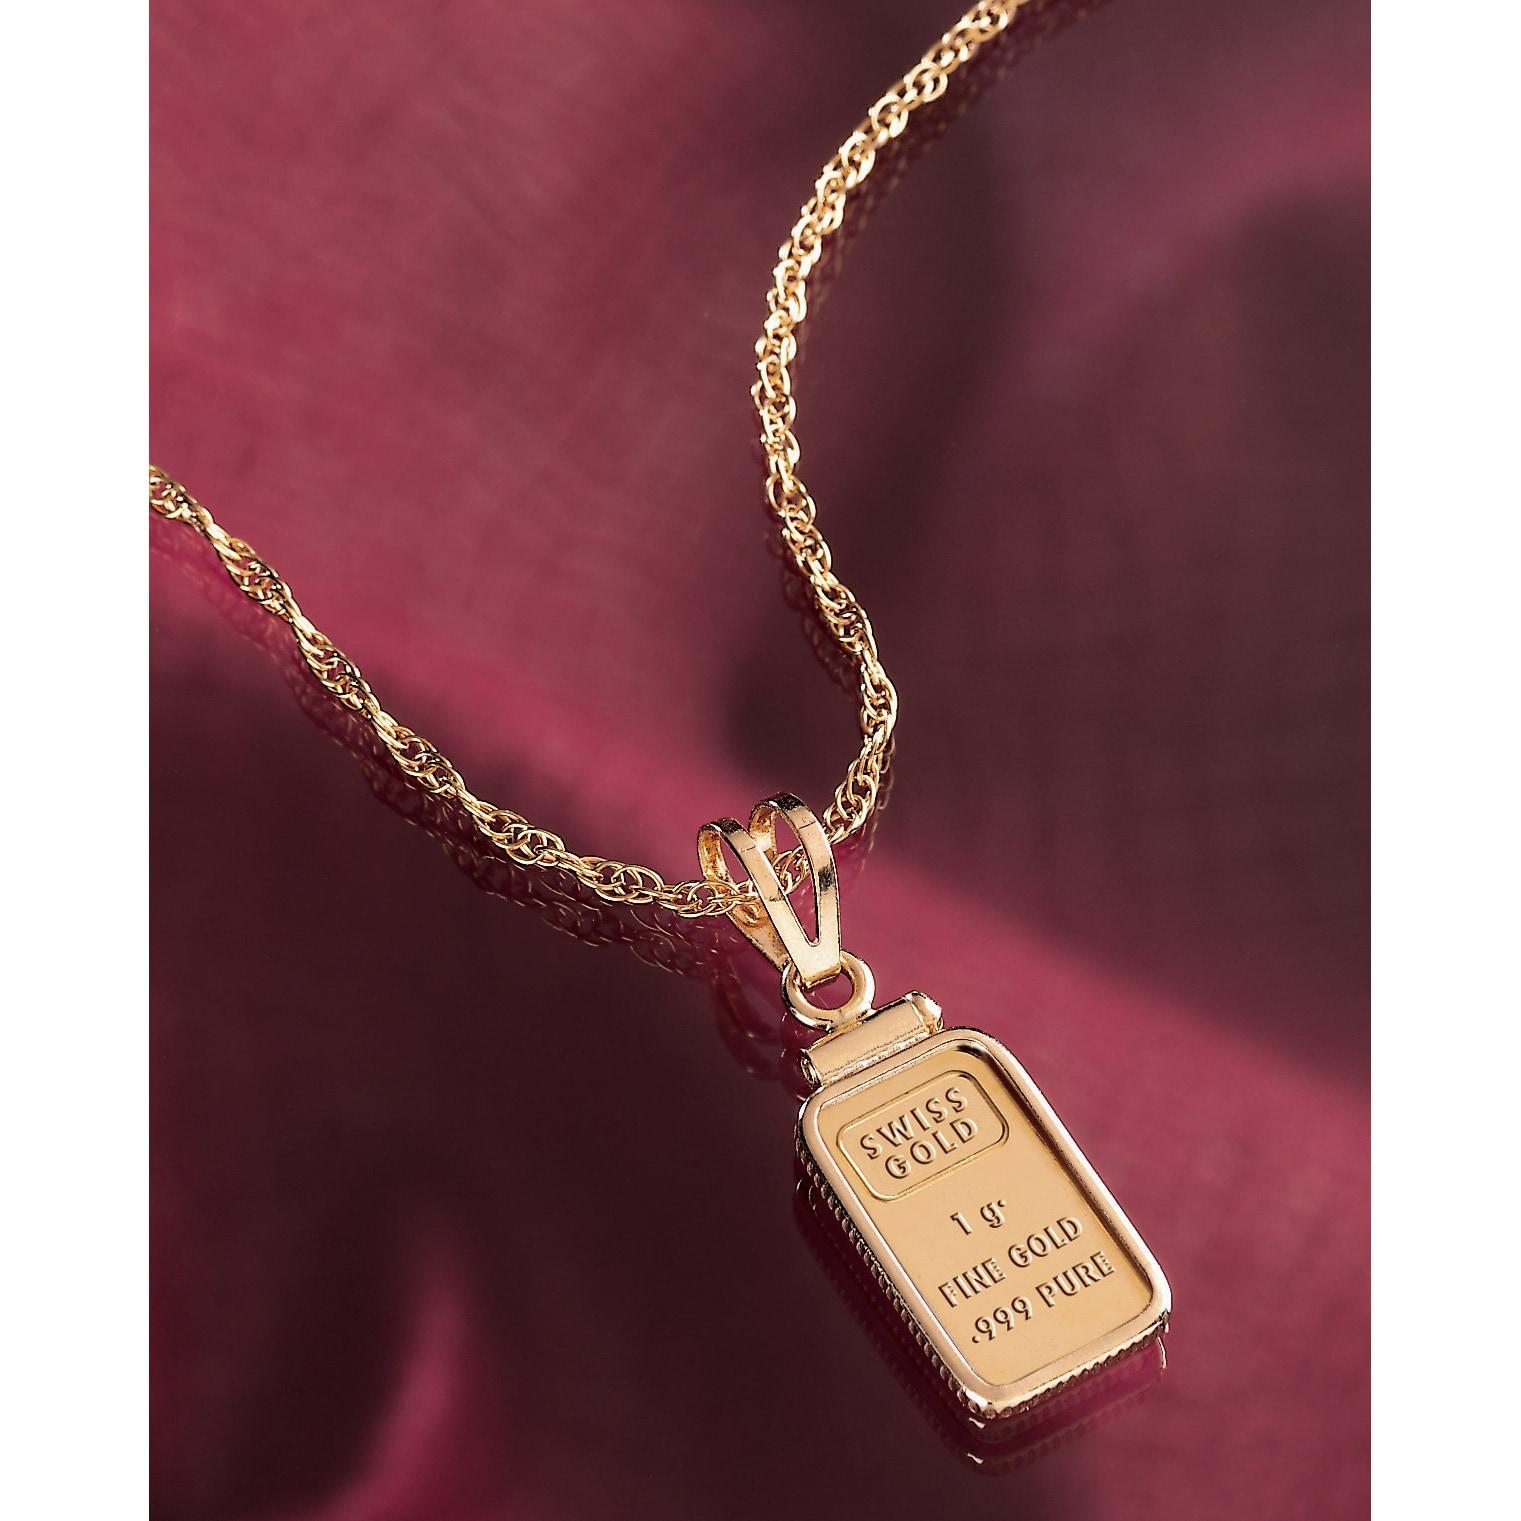 American coin treasures 1 gram gold ingot pendant necklace free american coin treasures 1 gram gold ingot pendant necklace free shipping today overstock 10828854 aloadofball Image collections